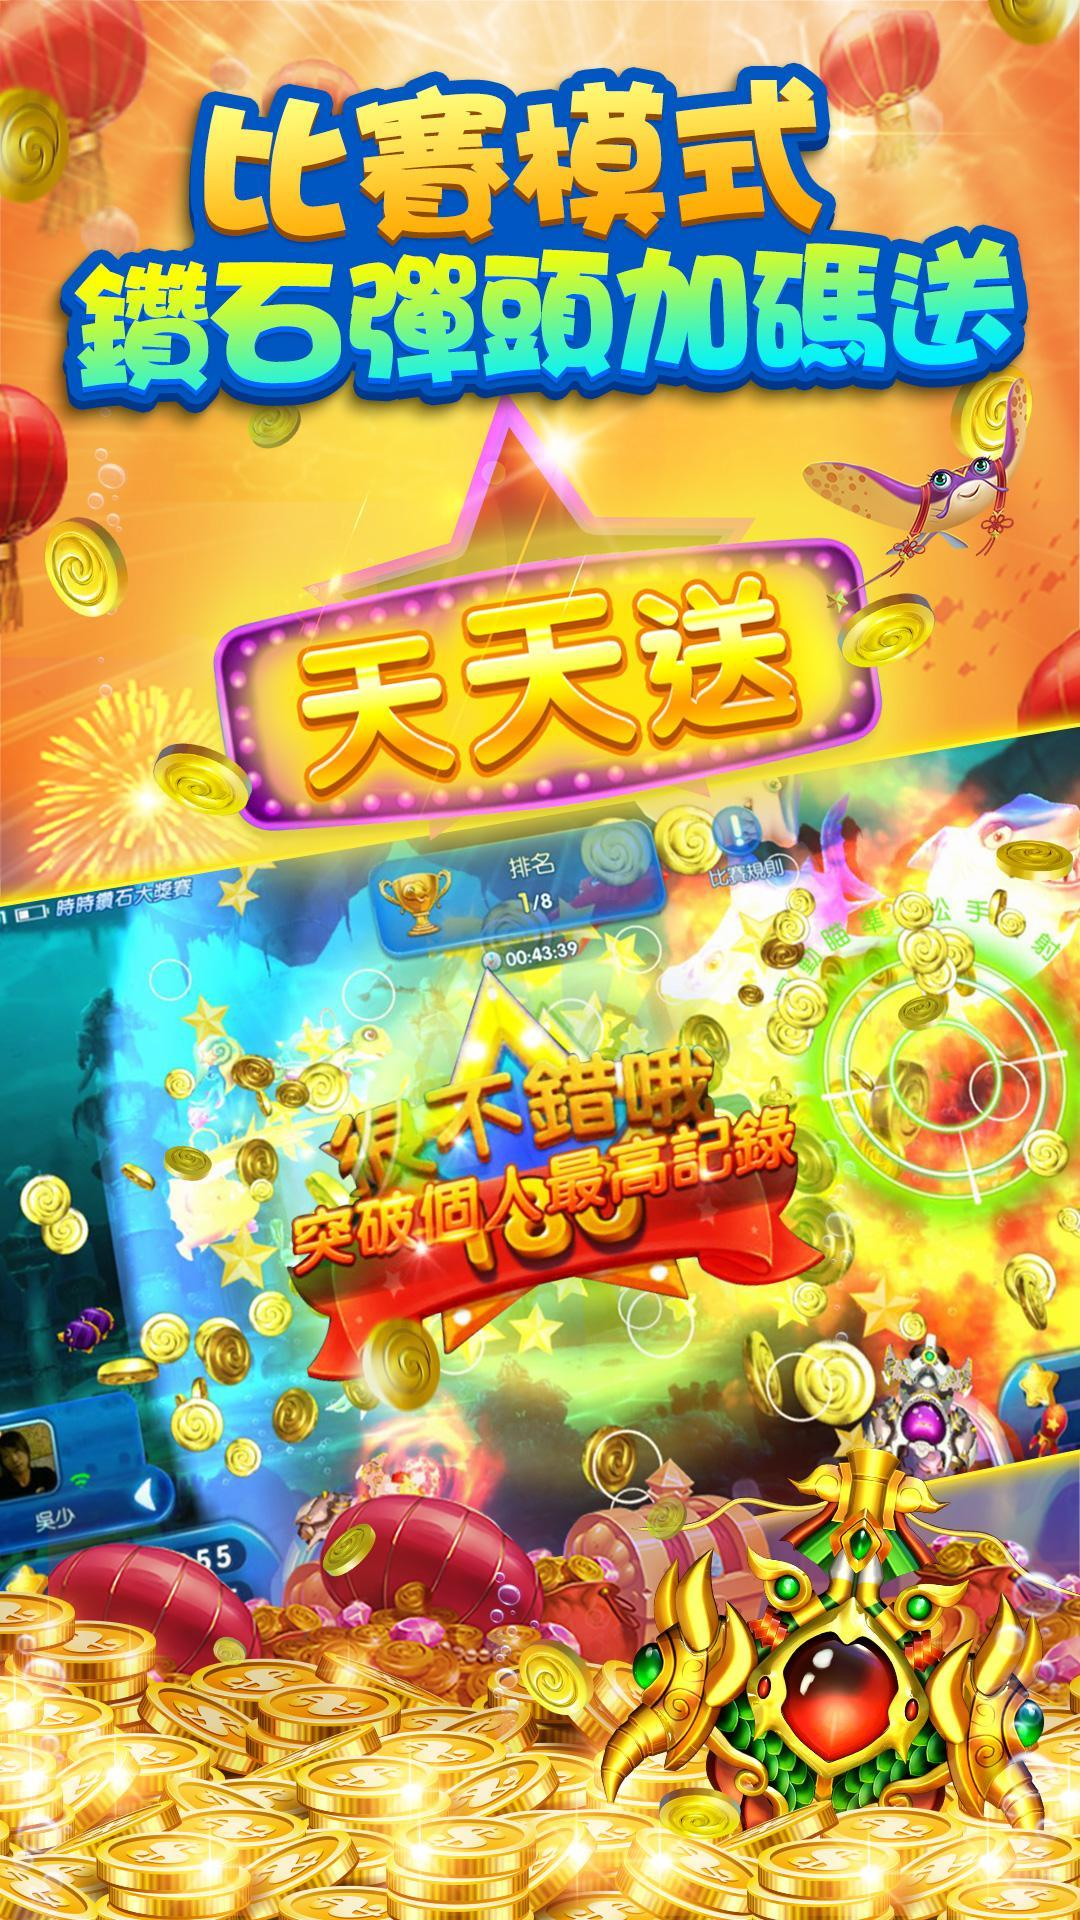 Fish is Coming: Best 3D Arcade 1.16.2 Screenshot 12